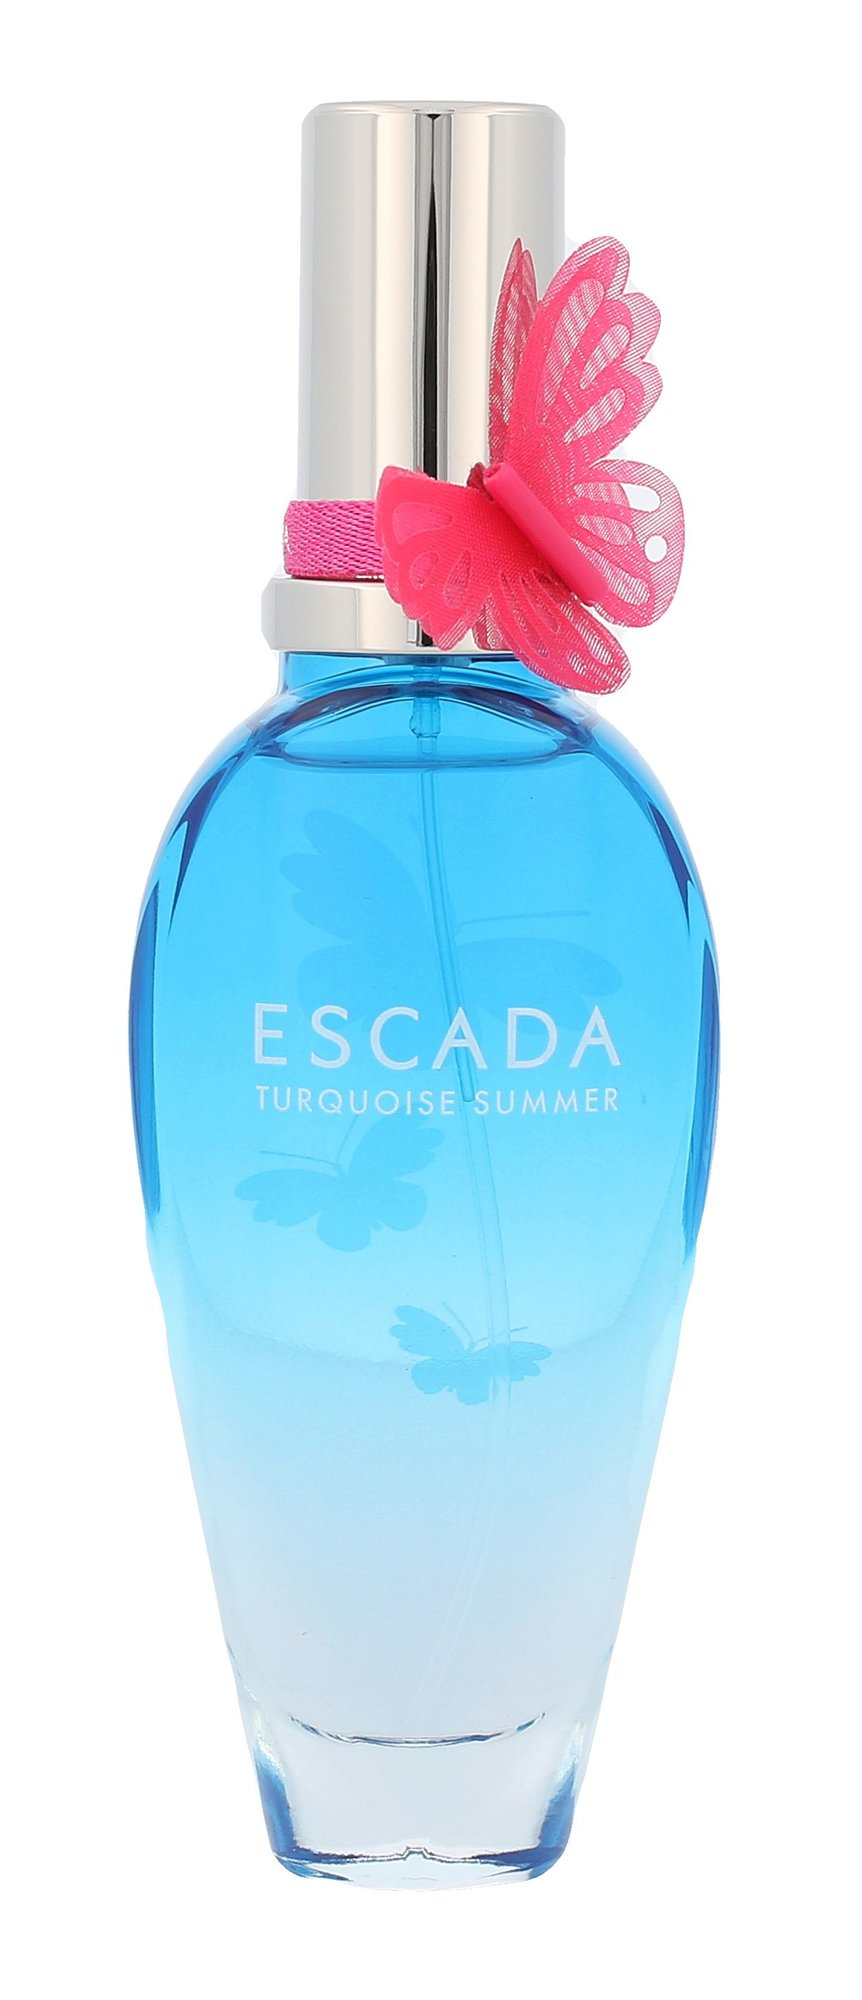 ESCADA Turquoise Summer EDT 50ml